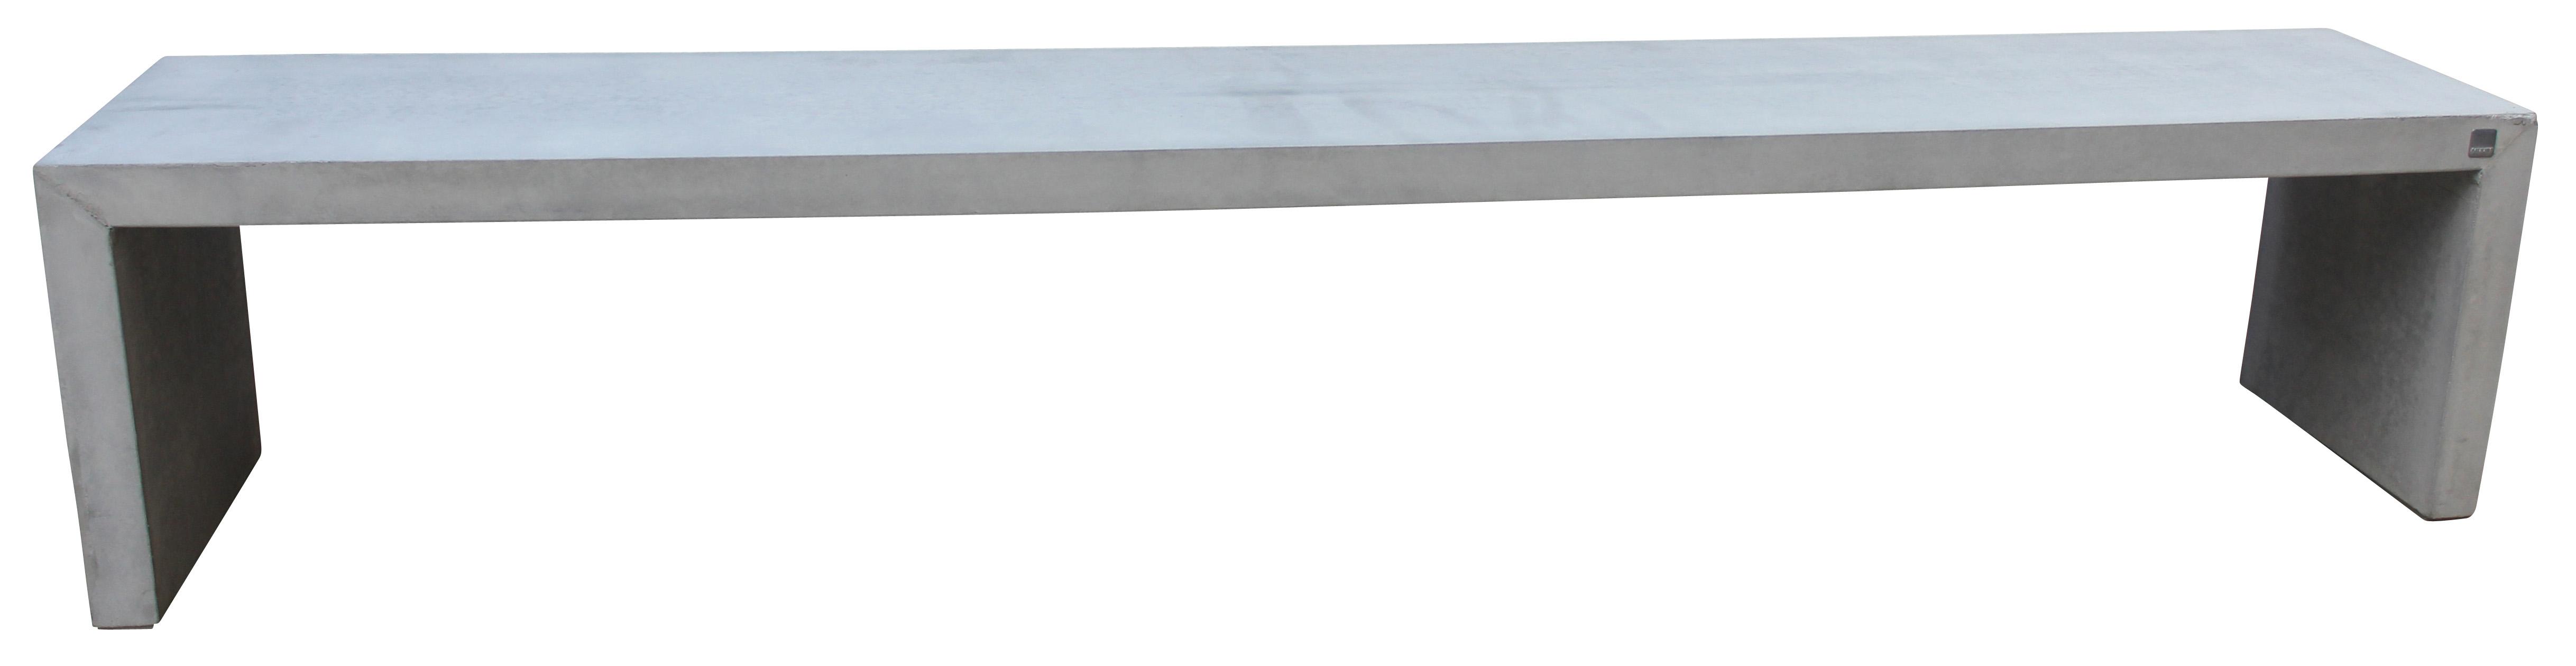 Brooklyn Bänk - betong/grå